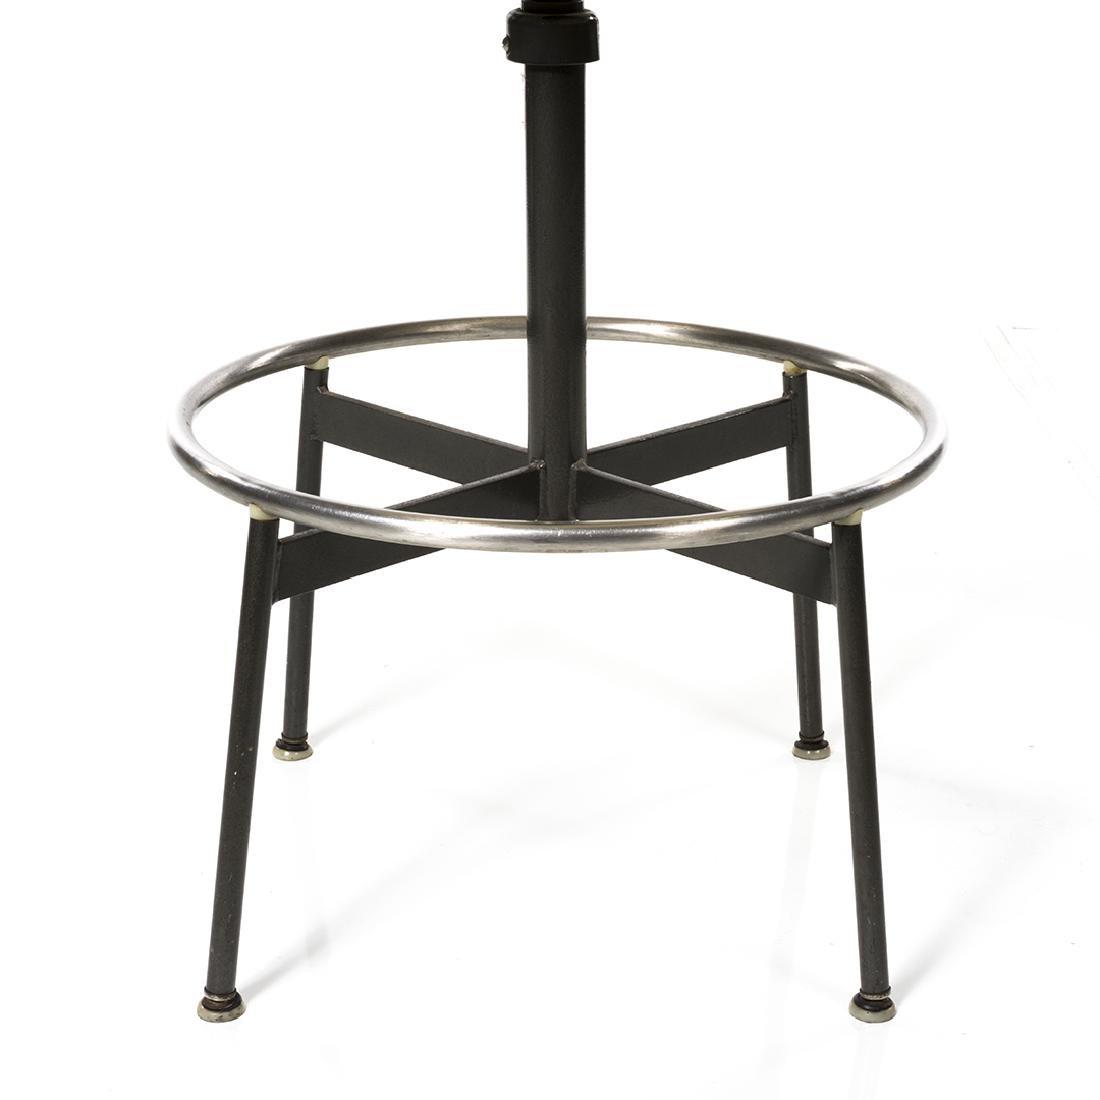 Charles Eames Drafting Stool - 5